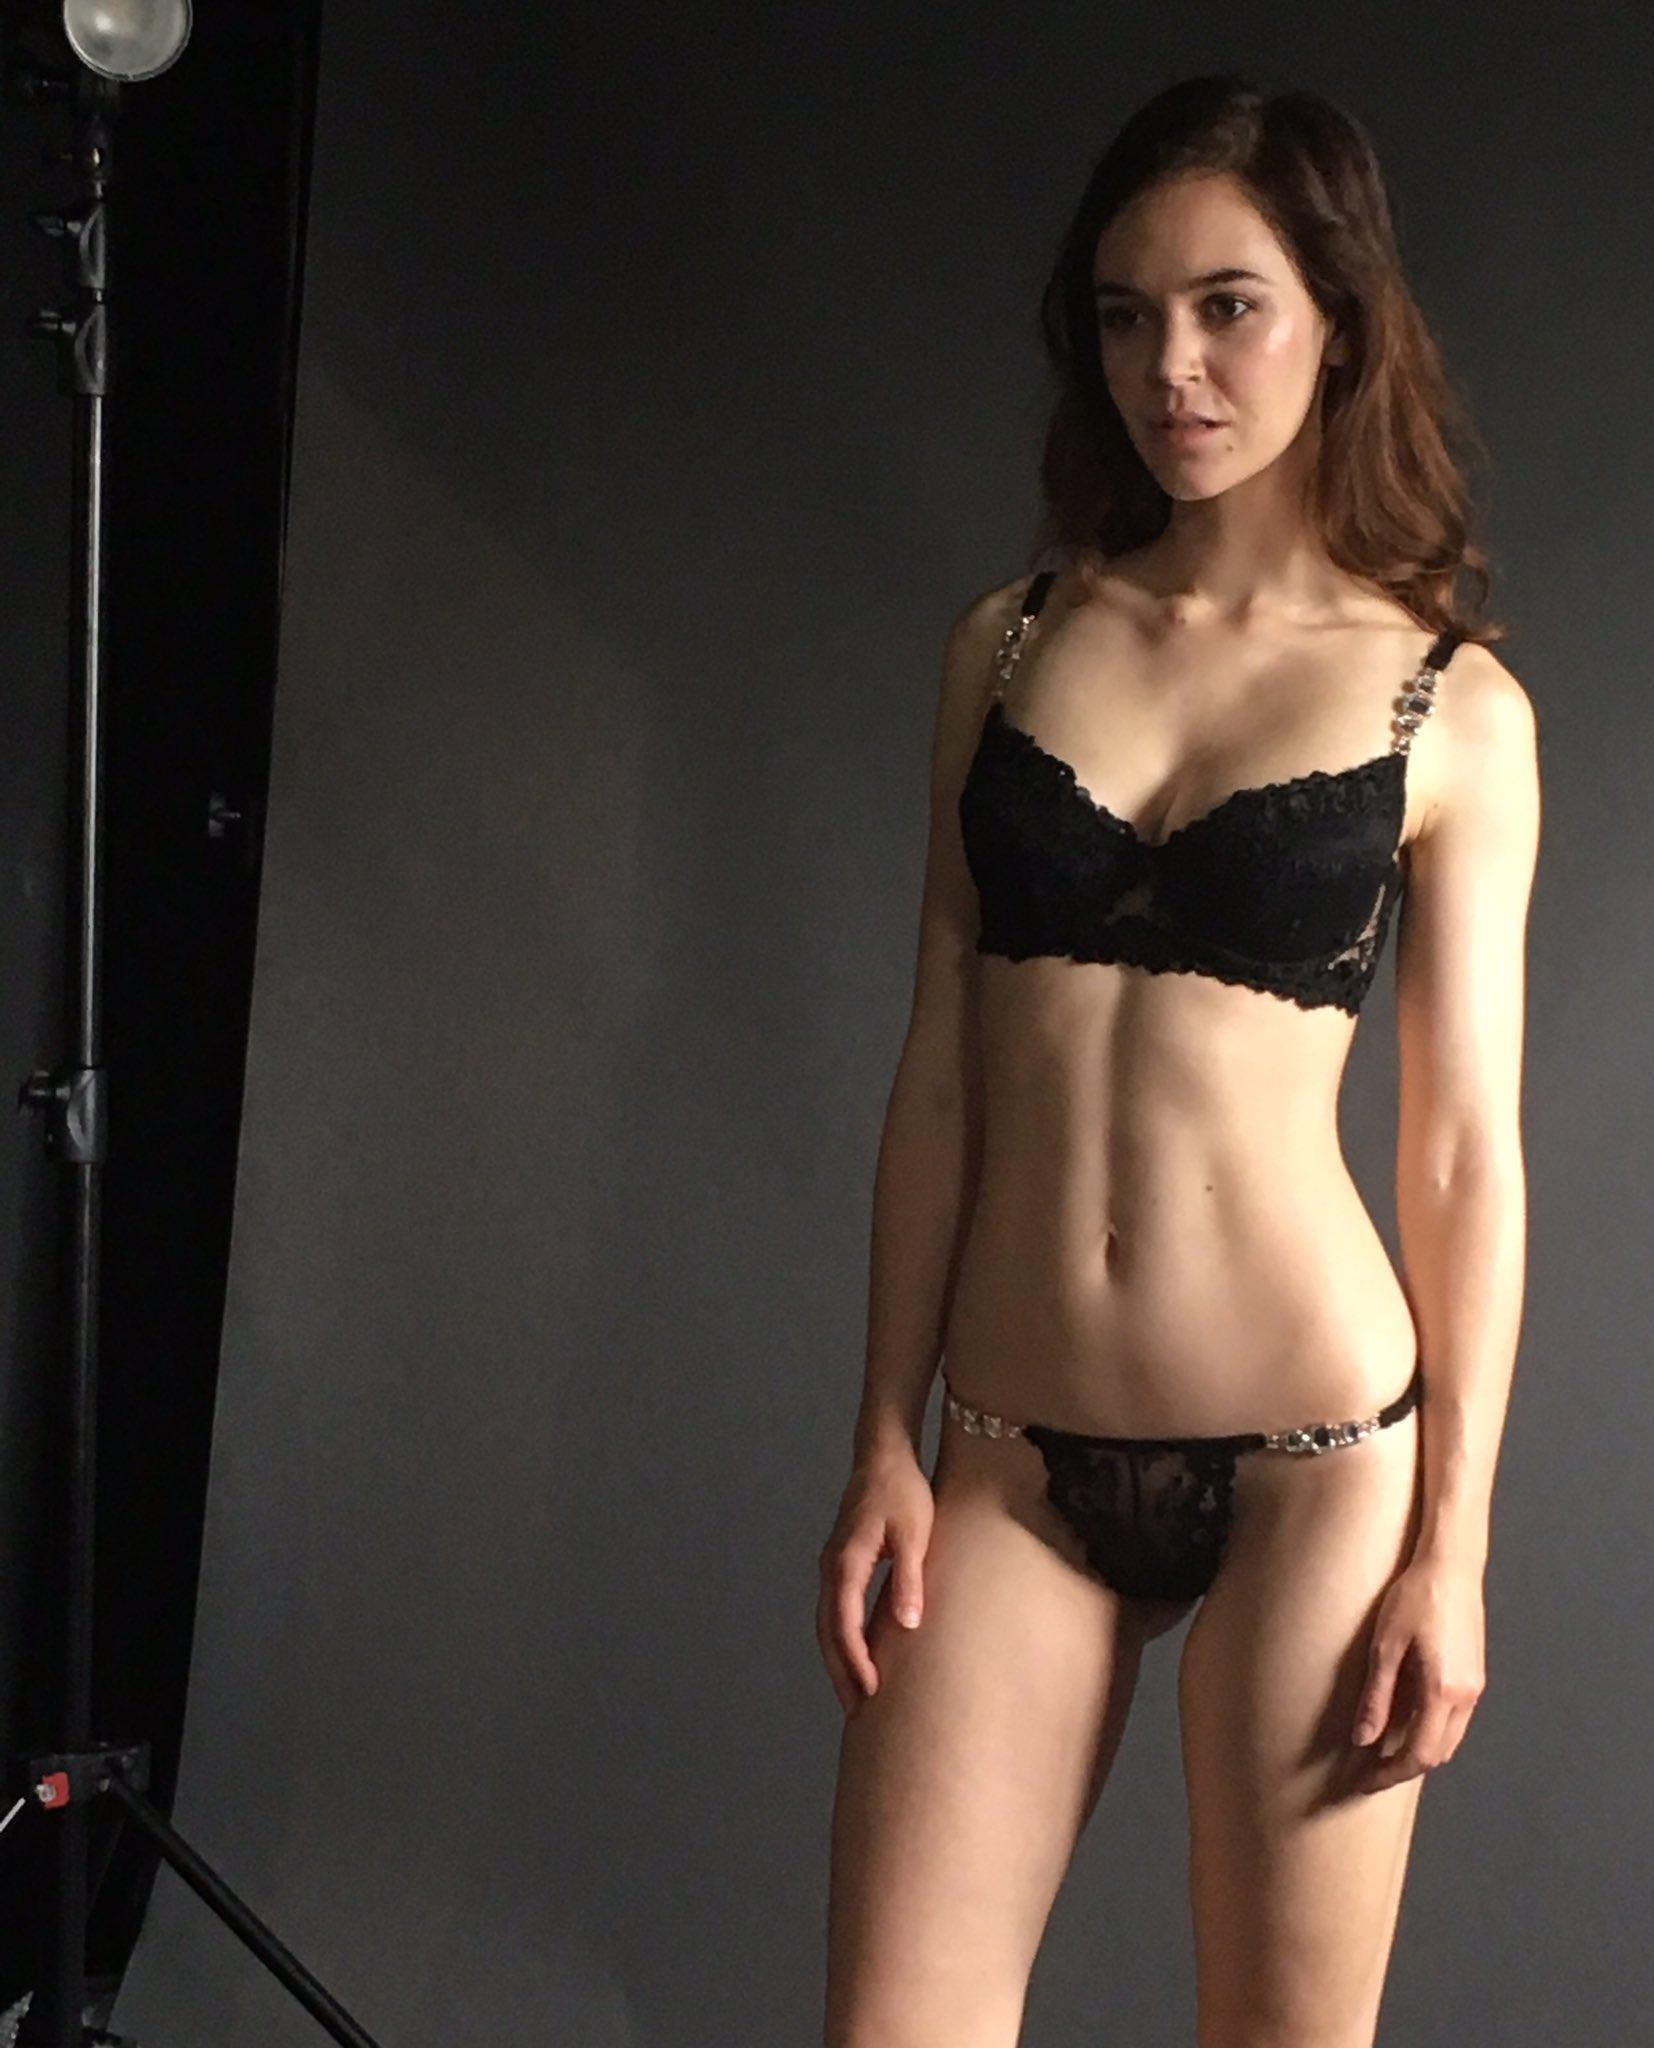 Pics Fanny Beladona nude (86 foto and video), Pussy, Paparazzi, Selfie, in bikini 2019